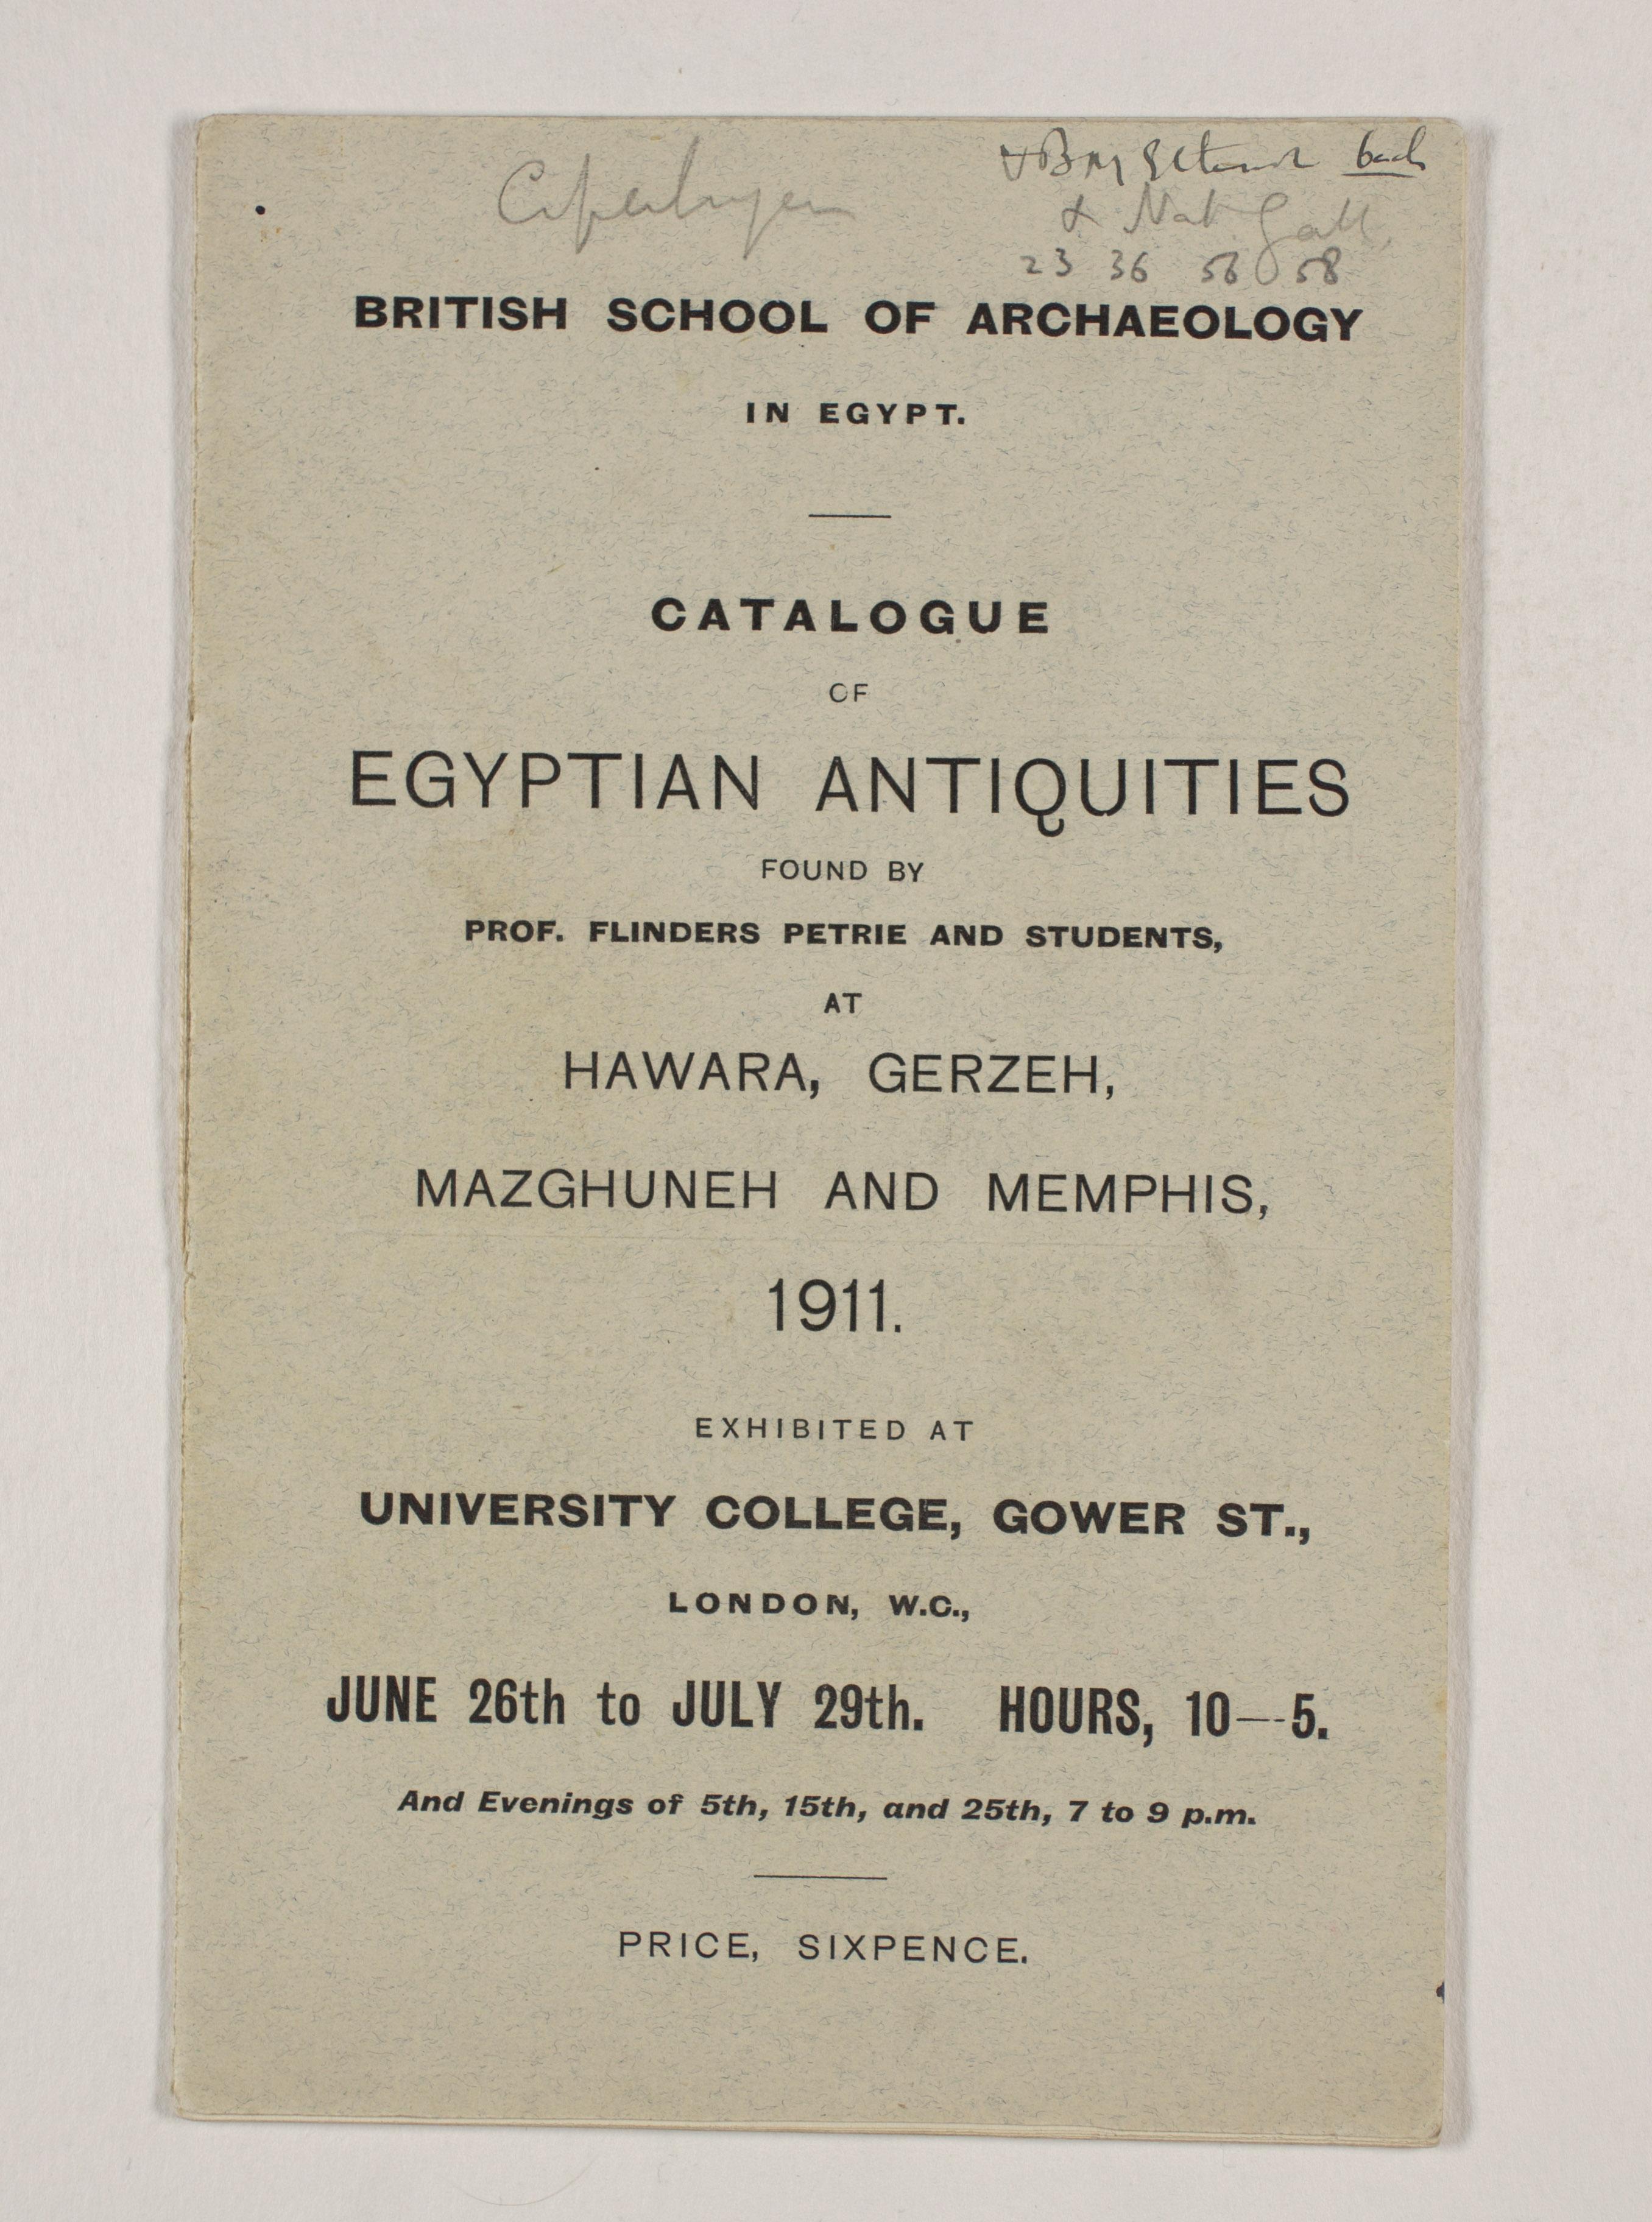 1910-11 Hawara, Gerzeh, Memphis, Mazghuneh Exhibition catalogue PMA/WFP1/D/19/33.1